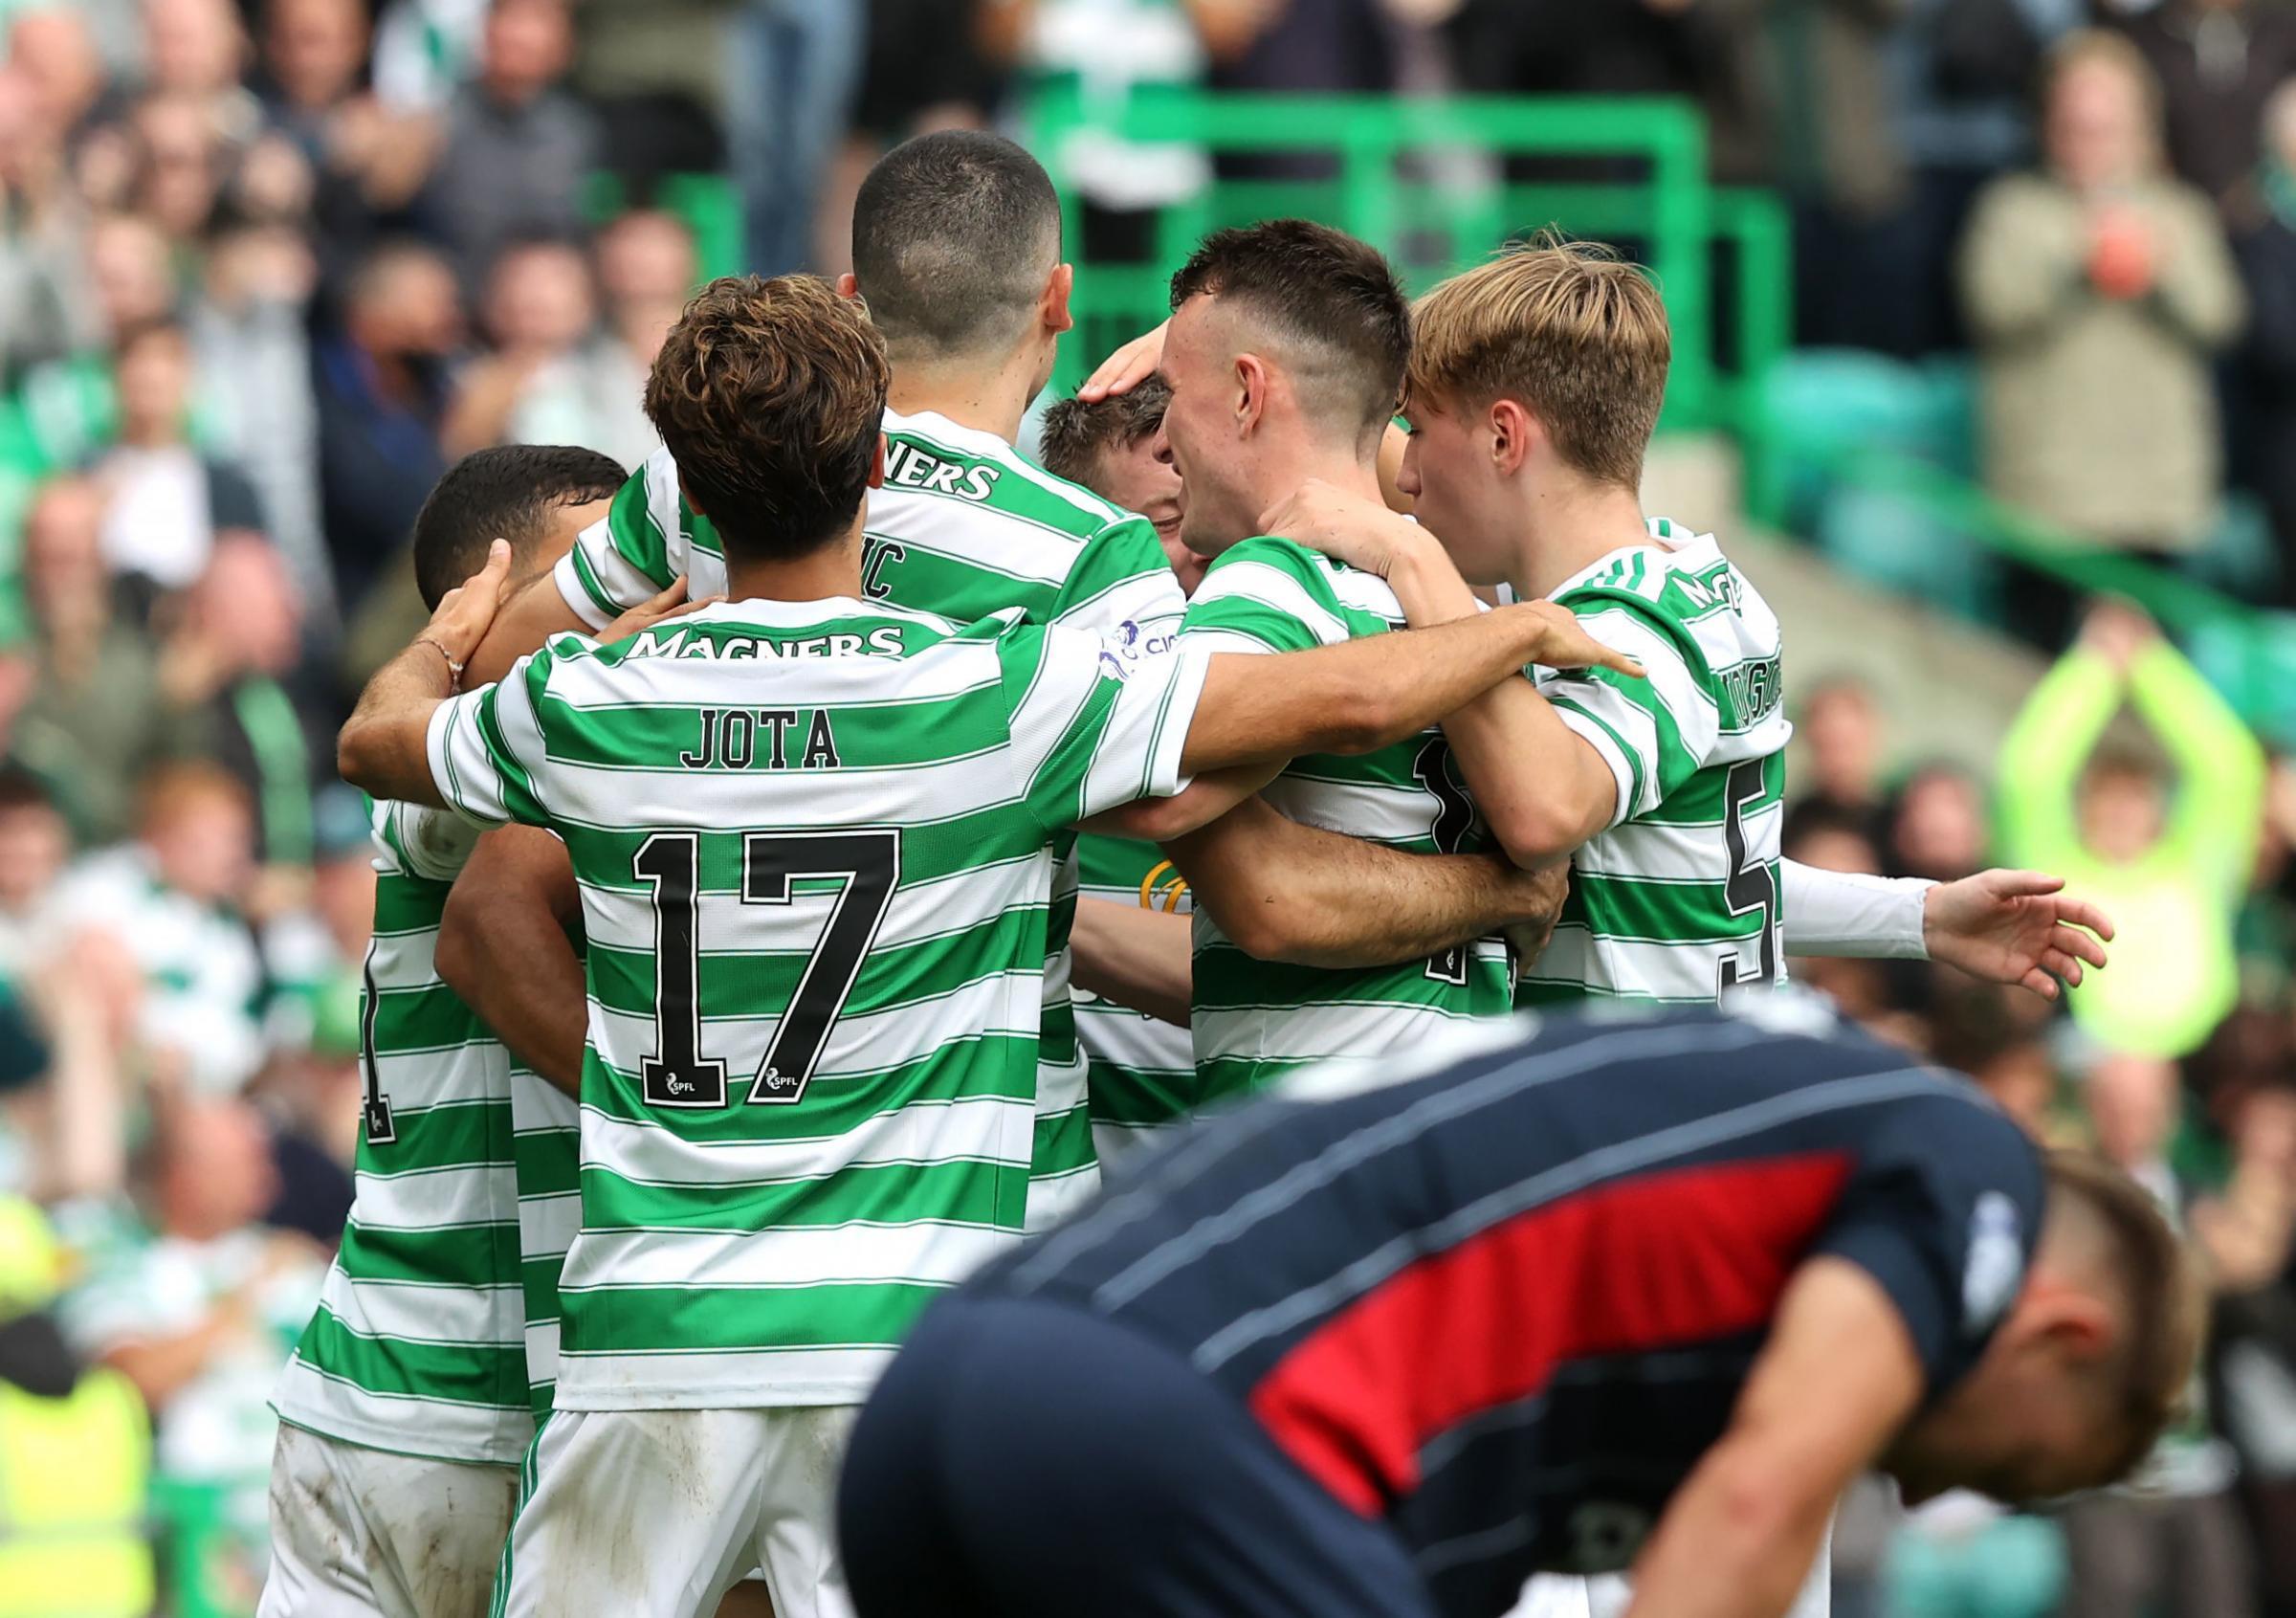 Celtic 3 Ross County 0: Five things we learned as debutants shine for Celtic